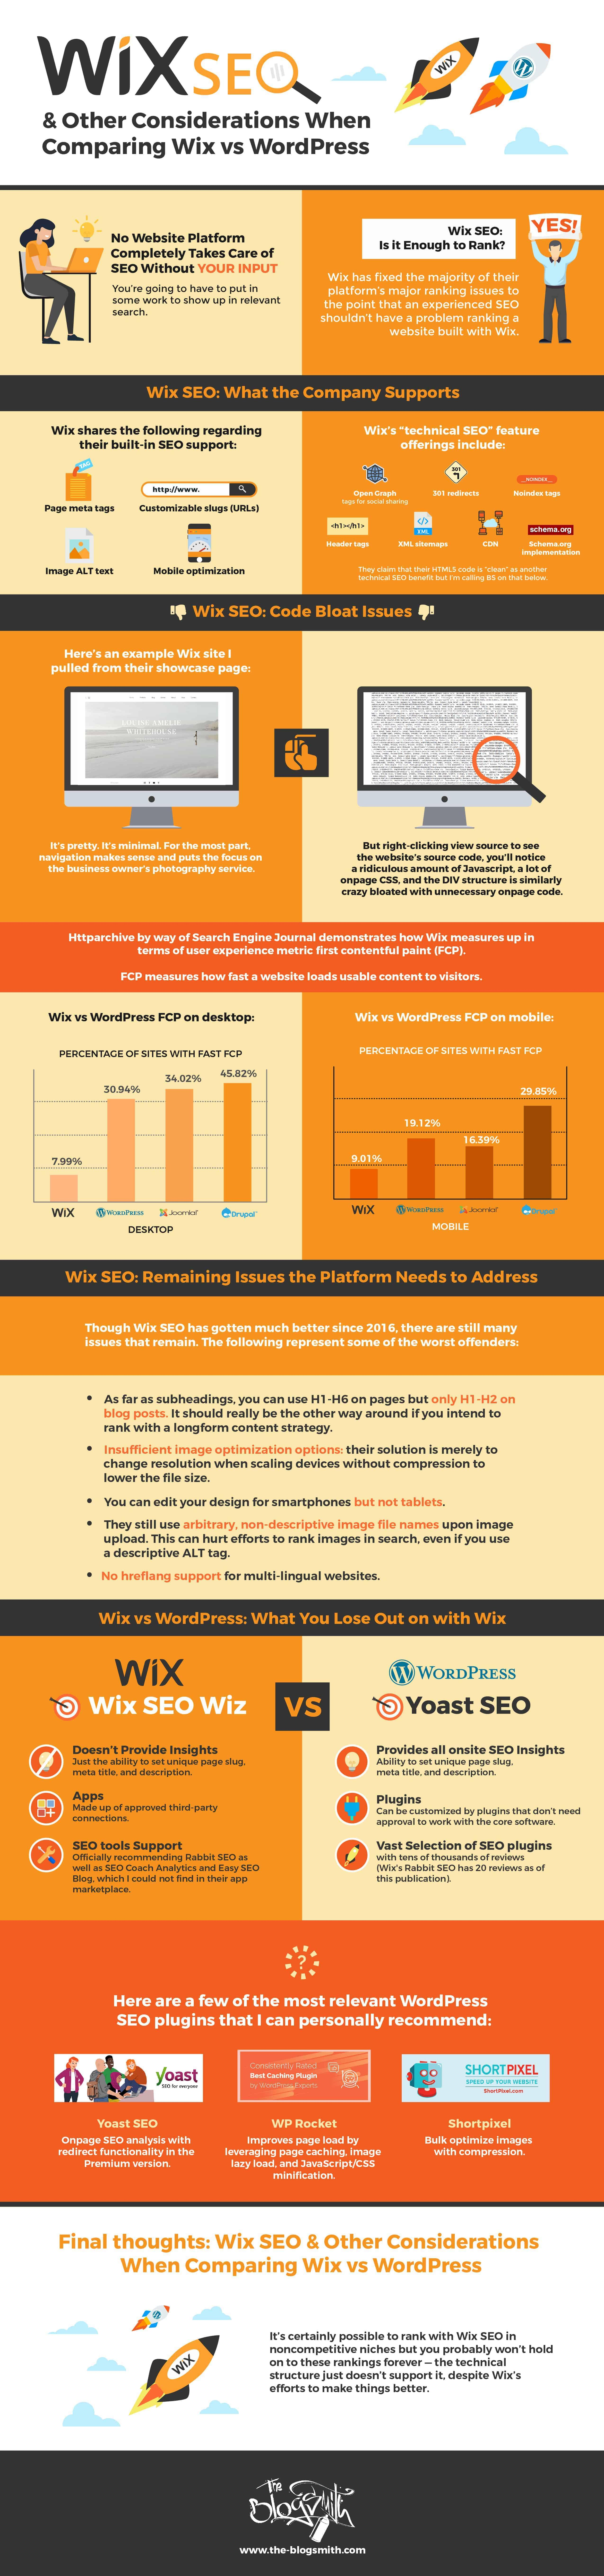 Wix SEO Wix vs WordPress